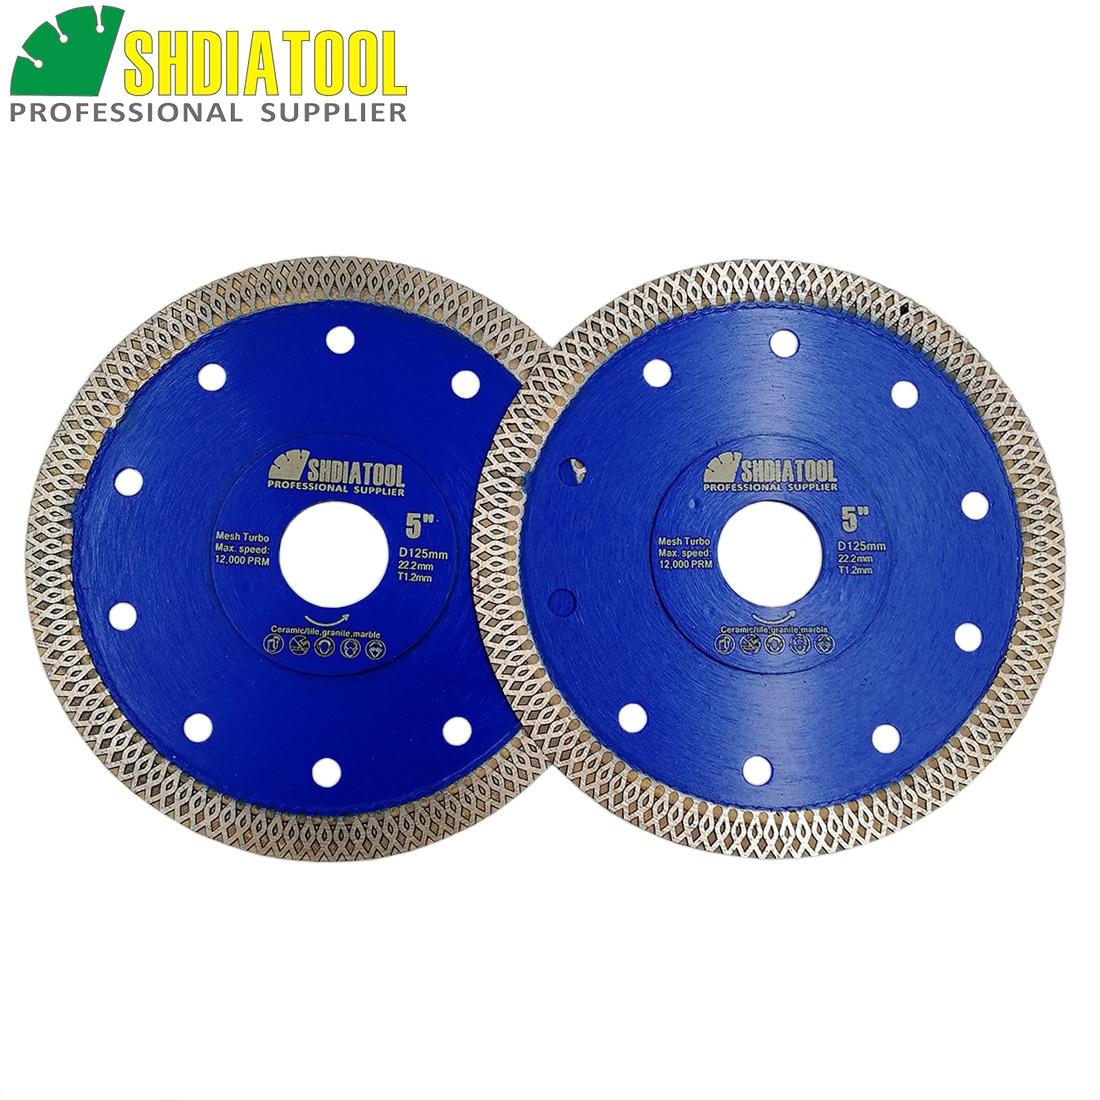 SHDIATOOL 2units Dia 5inch/125mm Hot Pressed Mesh Turbo Diamond Saw Blade Diamond Height 10MM Cutting Disc For Ceramic Tile